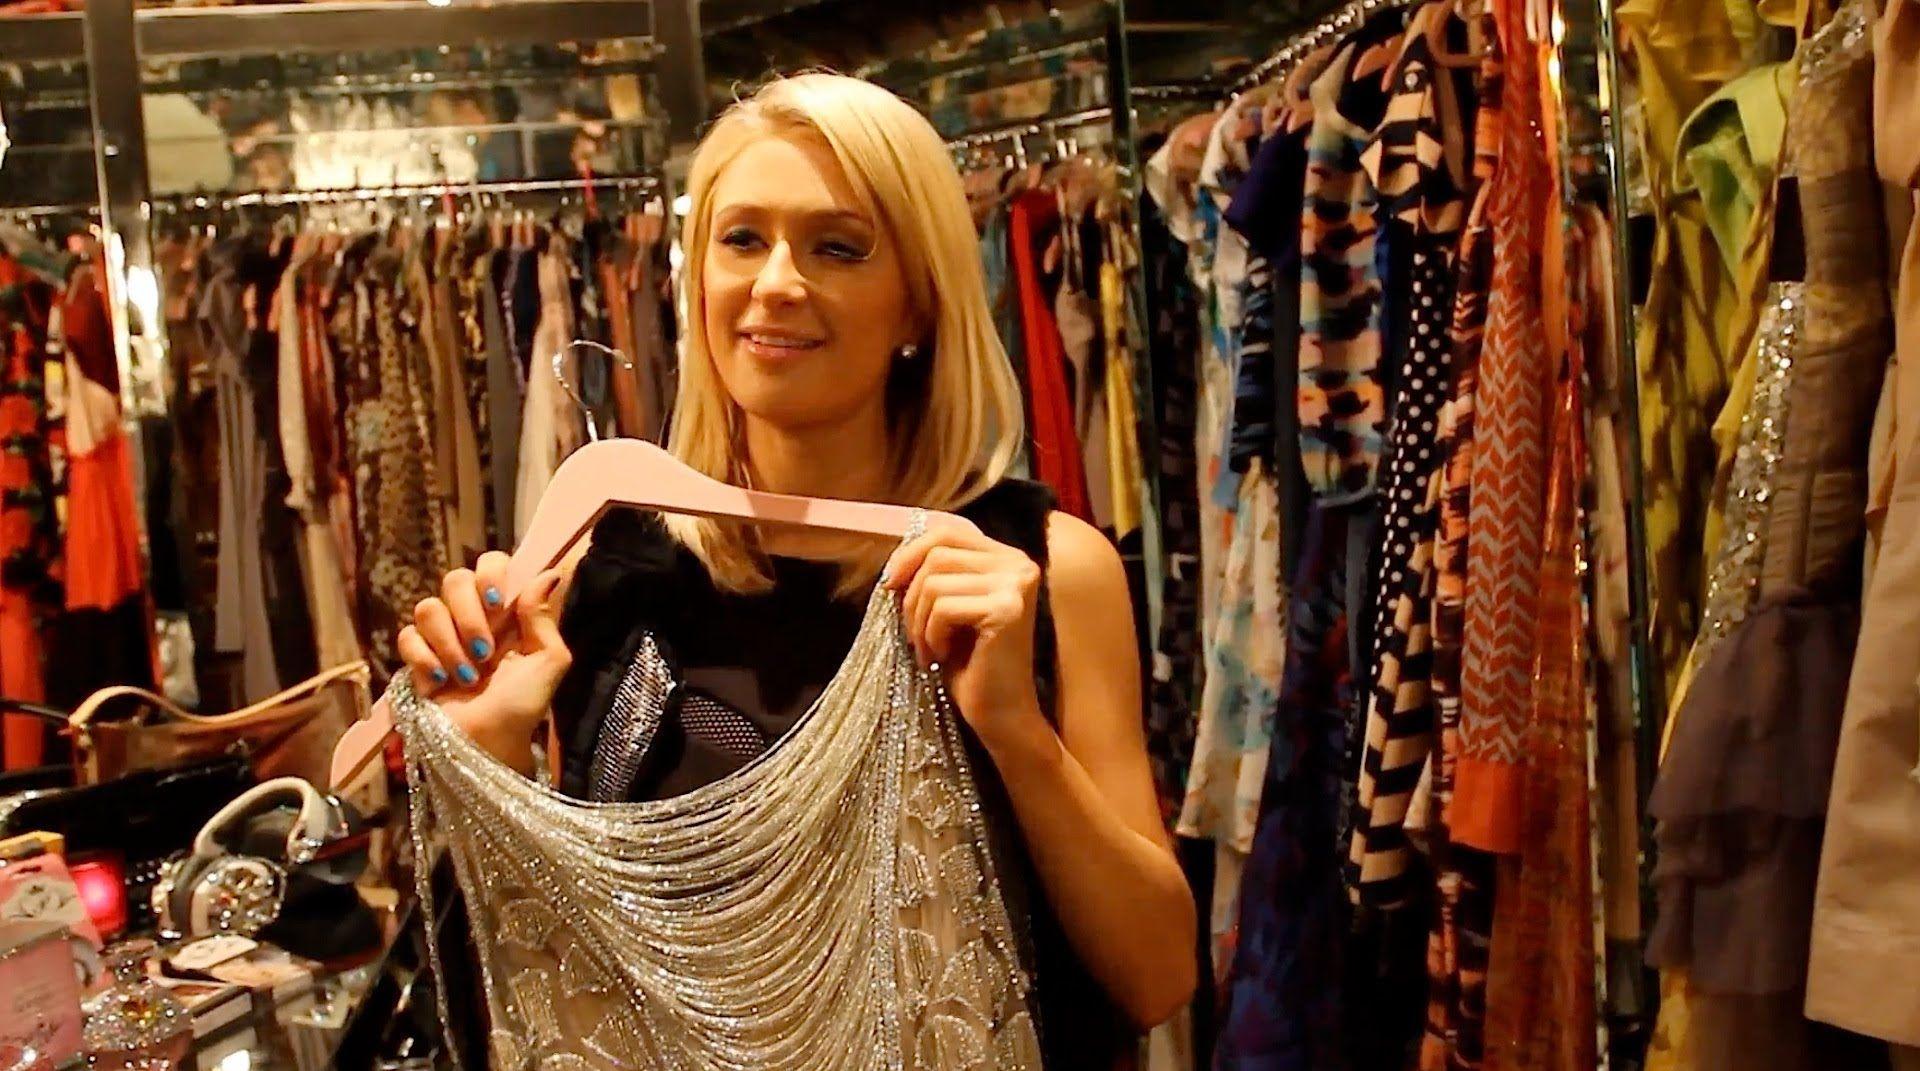 Cabina Armadio Paris Hilton.Going Inside Paris Hilton S Million Dollar Closet Closets